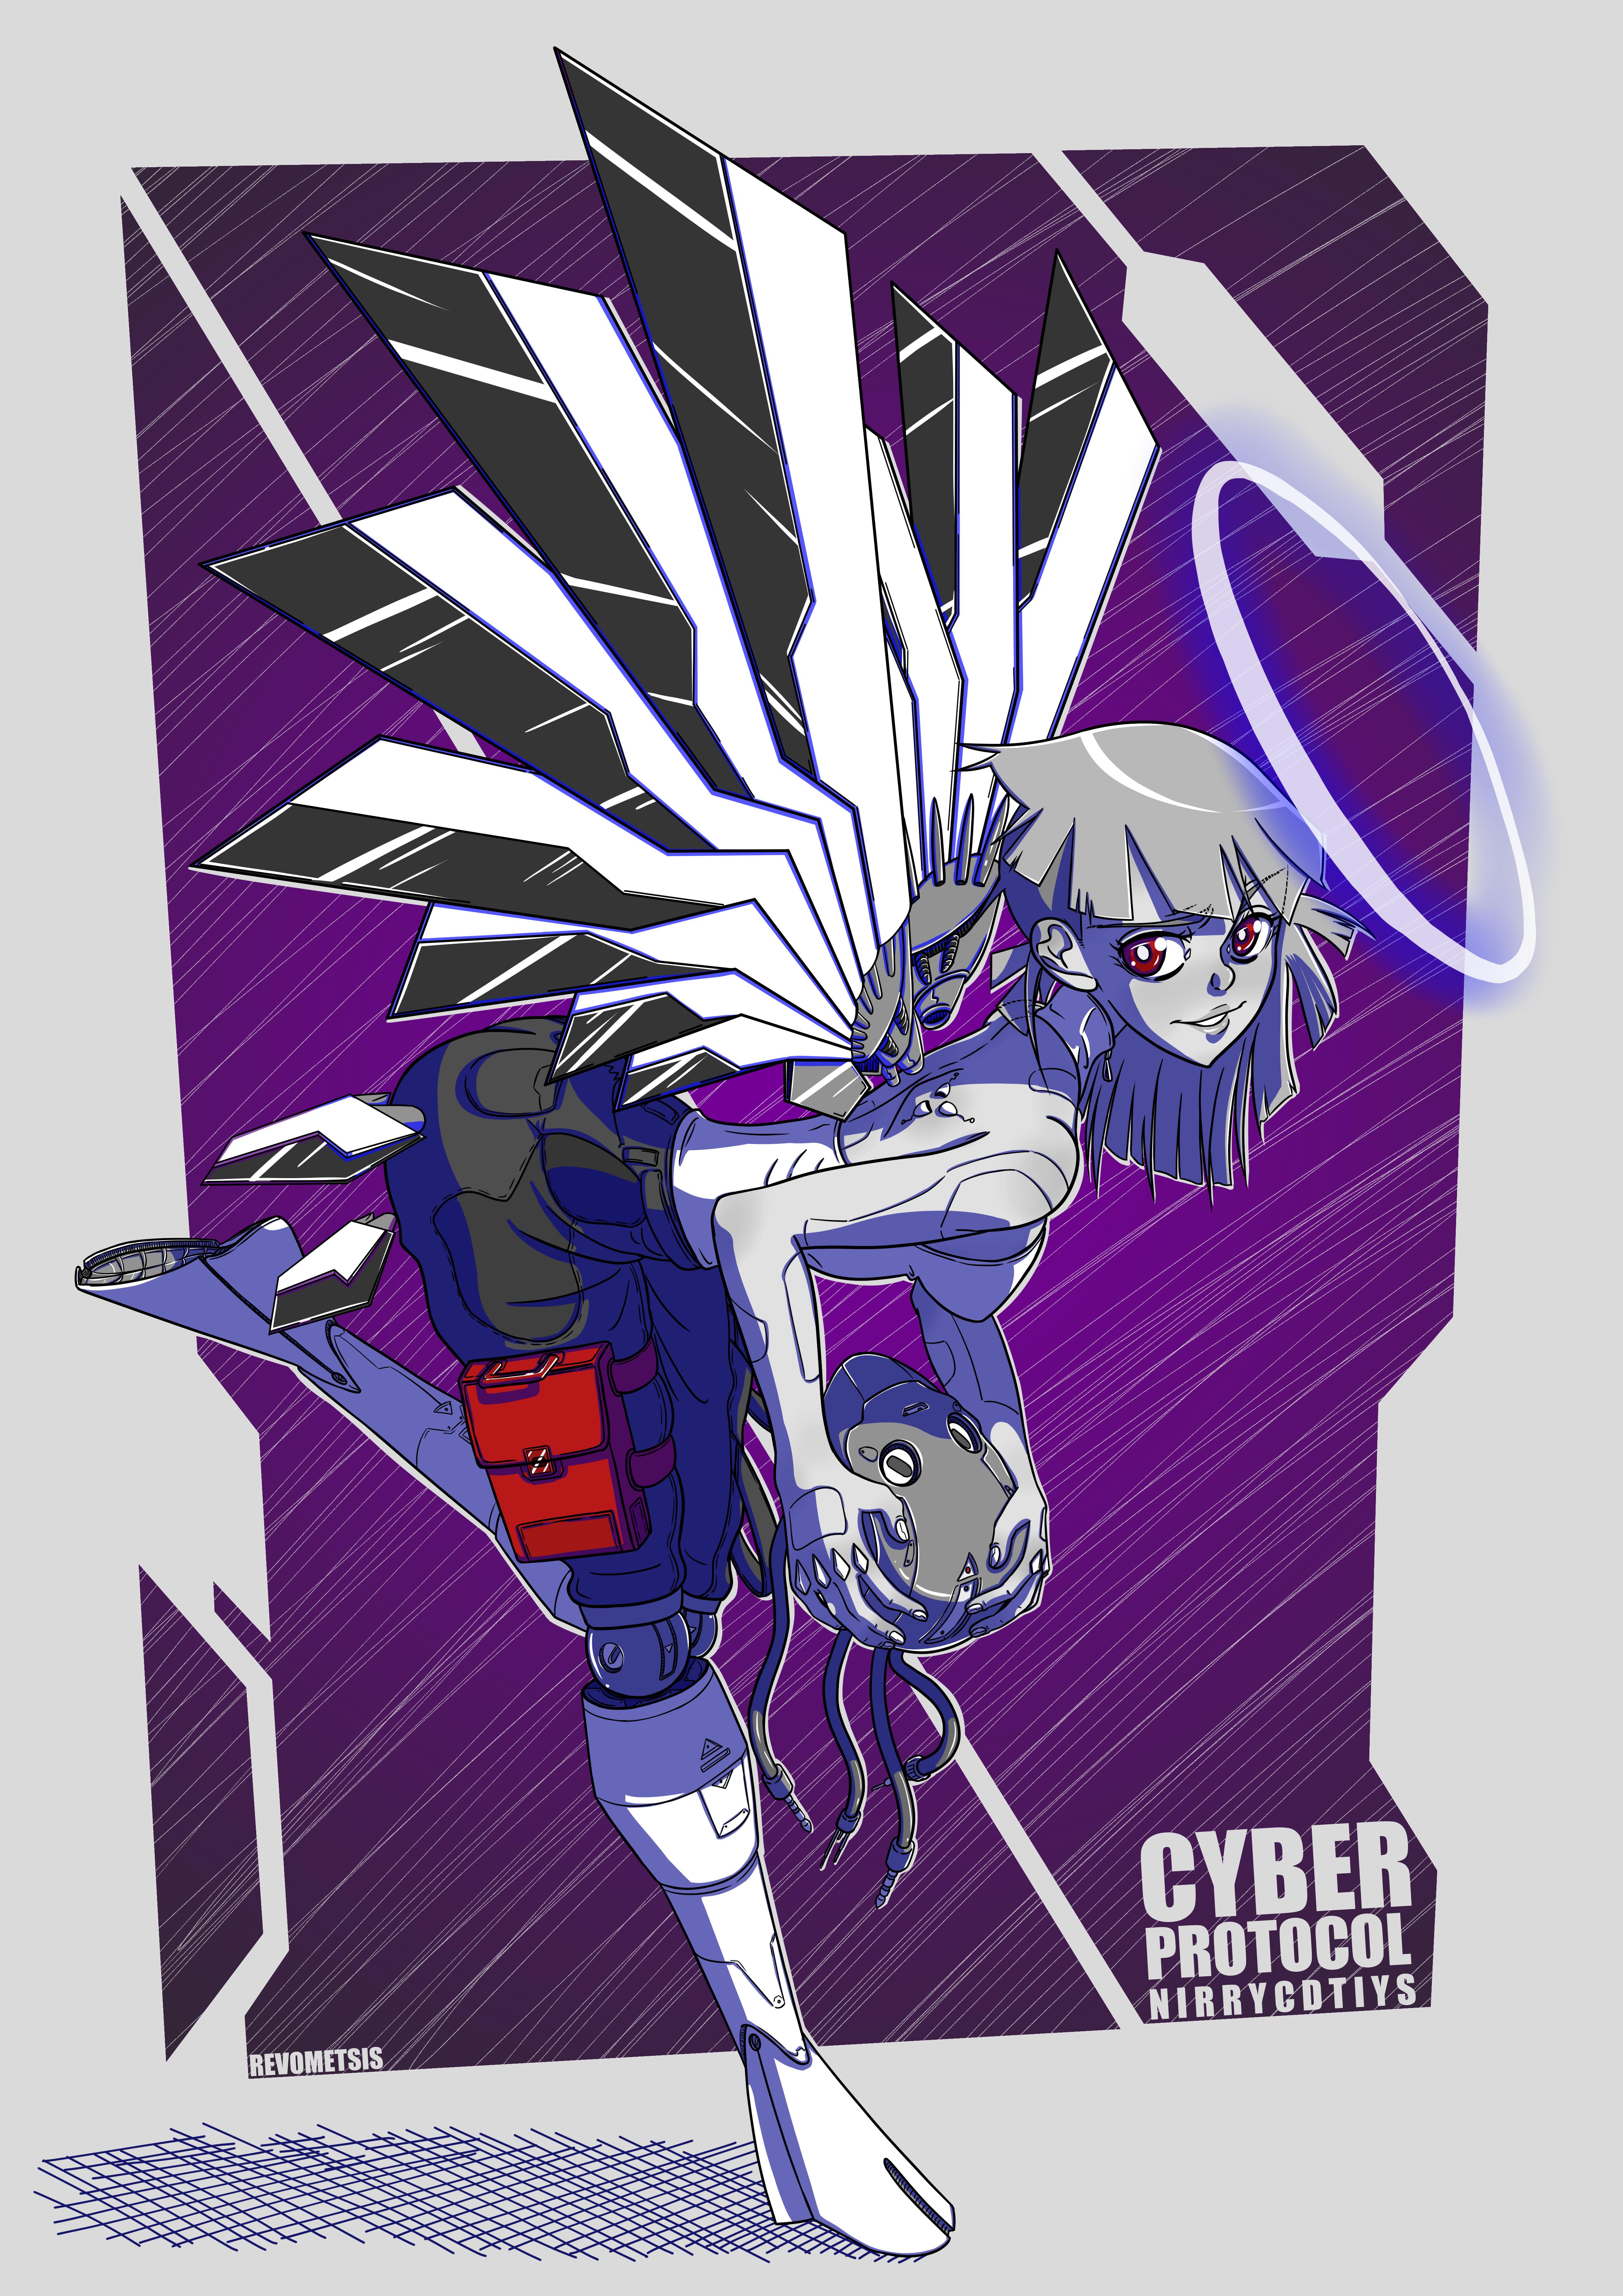 Cyber Protocol: NIRRYCDTIYS